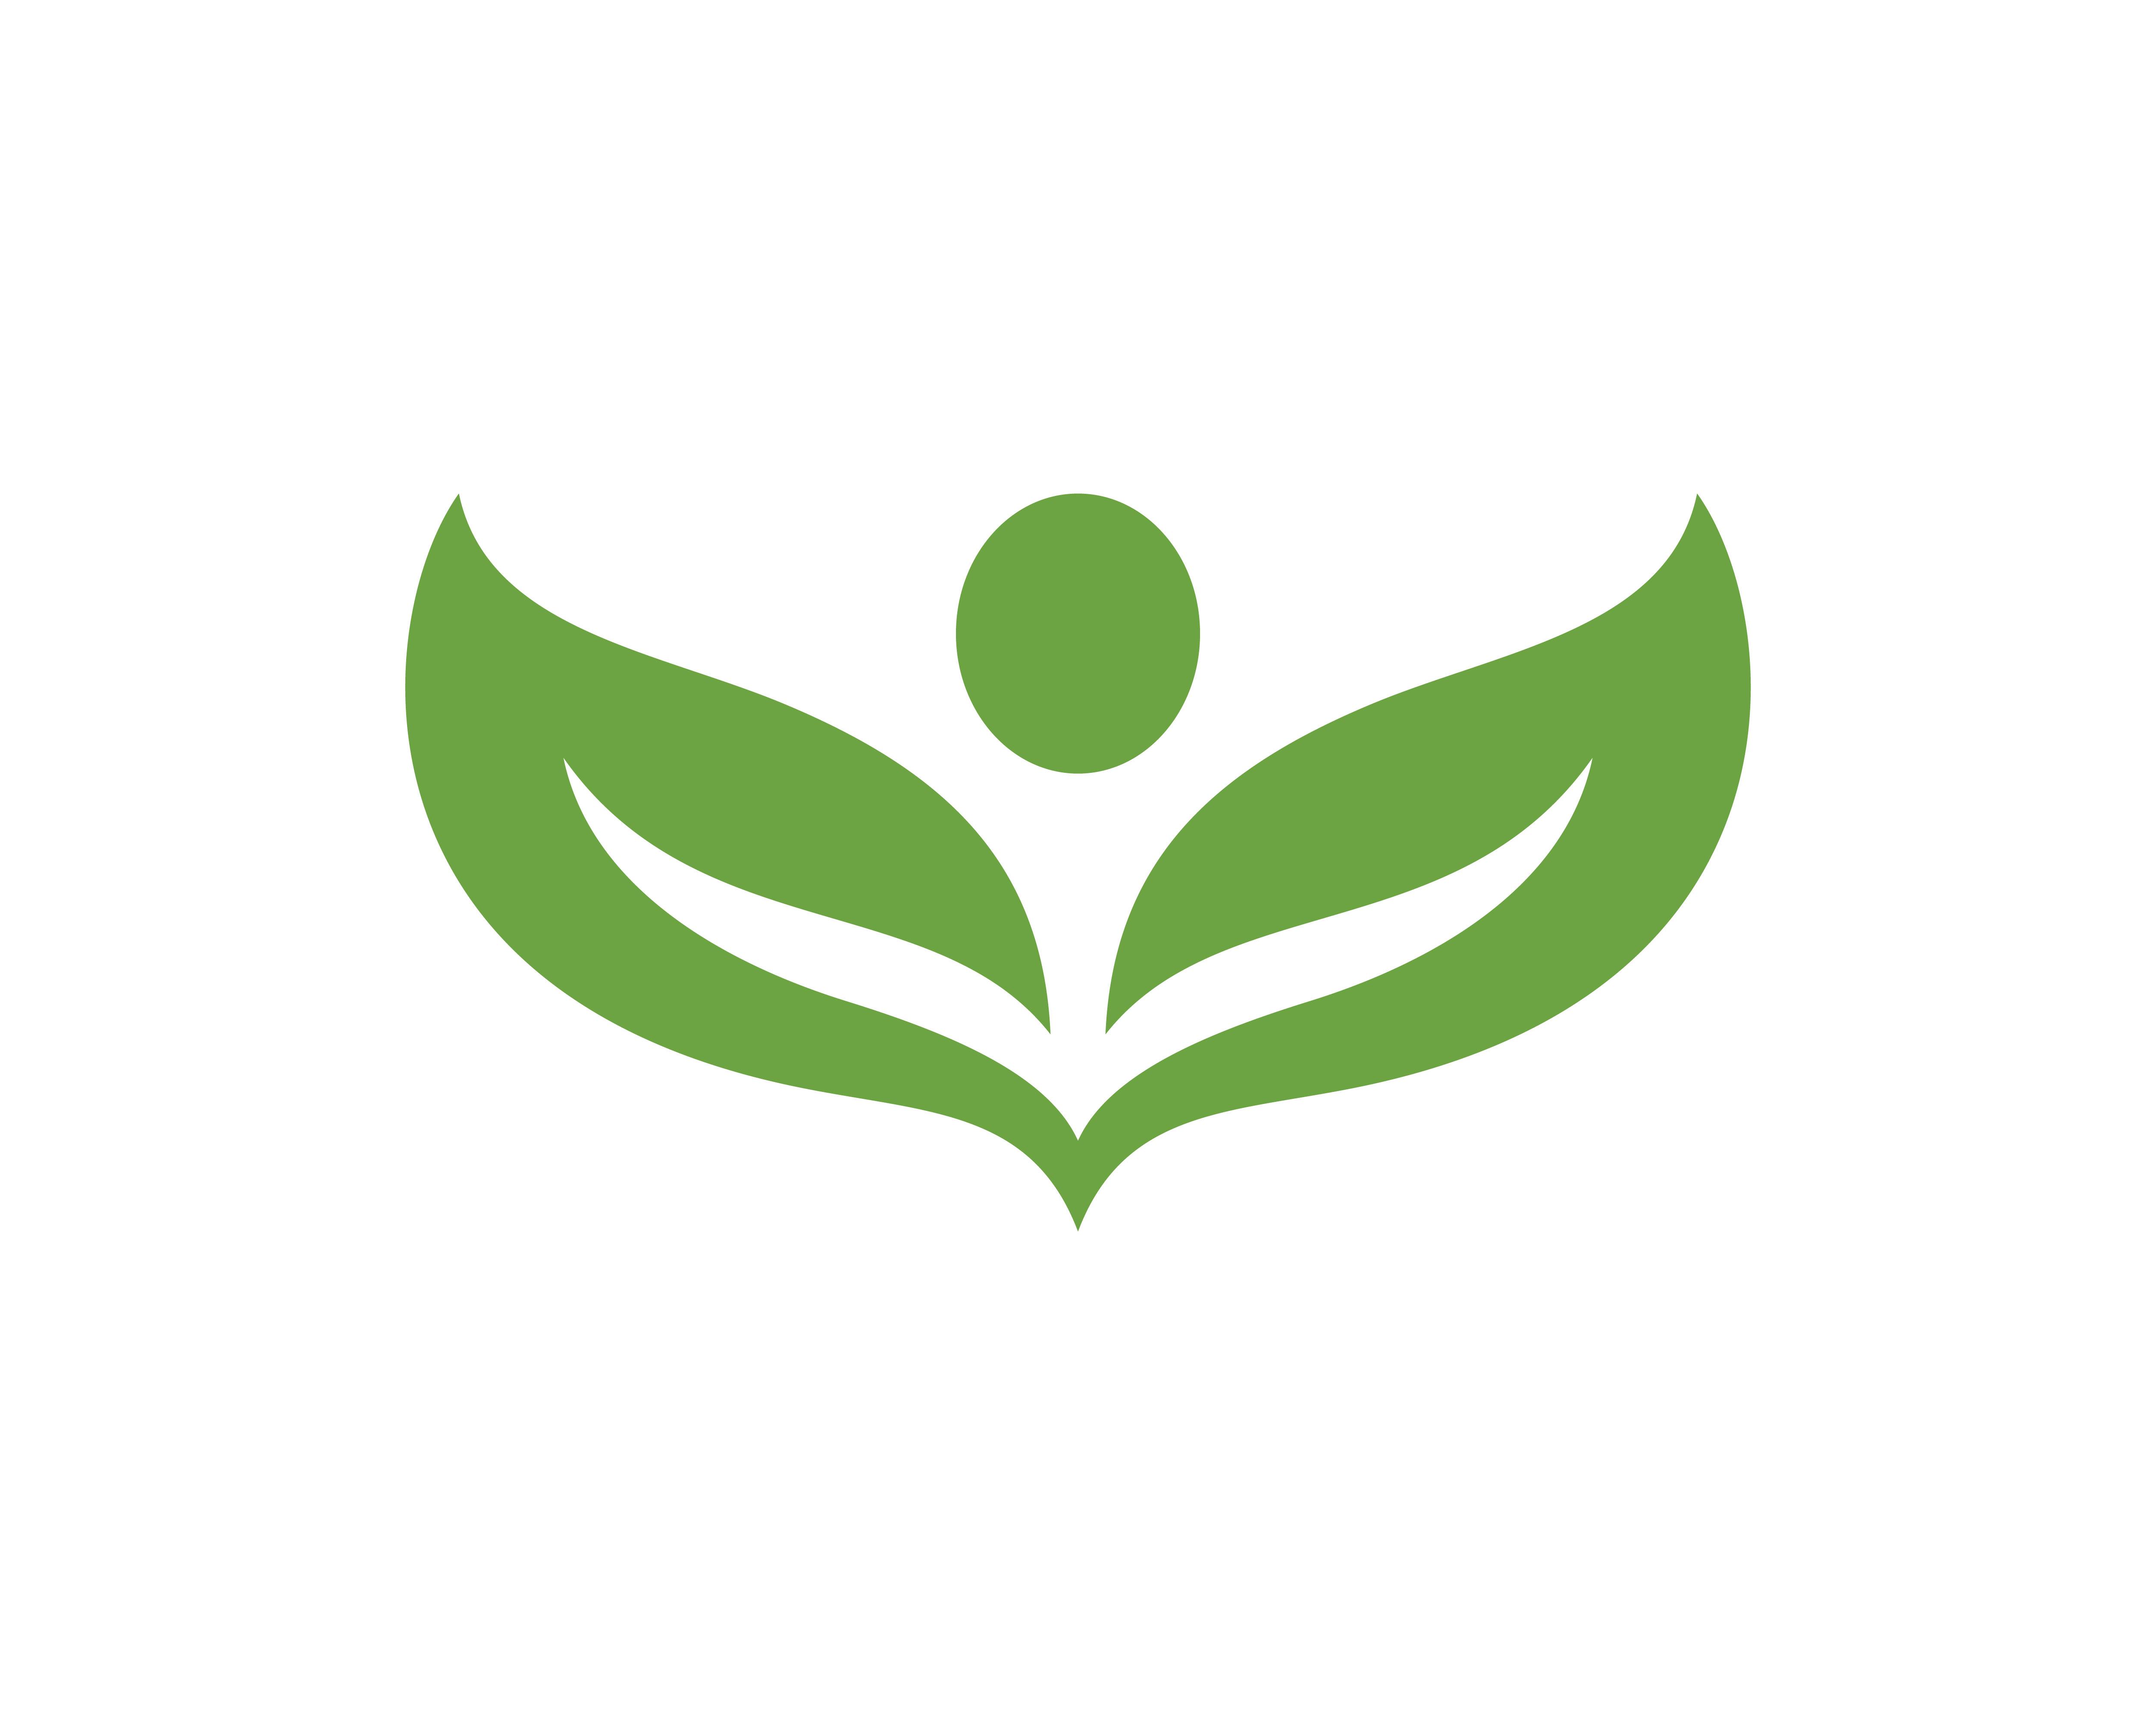 leaf green nature logo and symbol template download free vectors clipart graphics vector art vecteezy